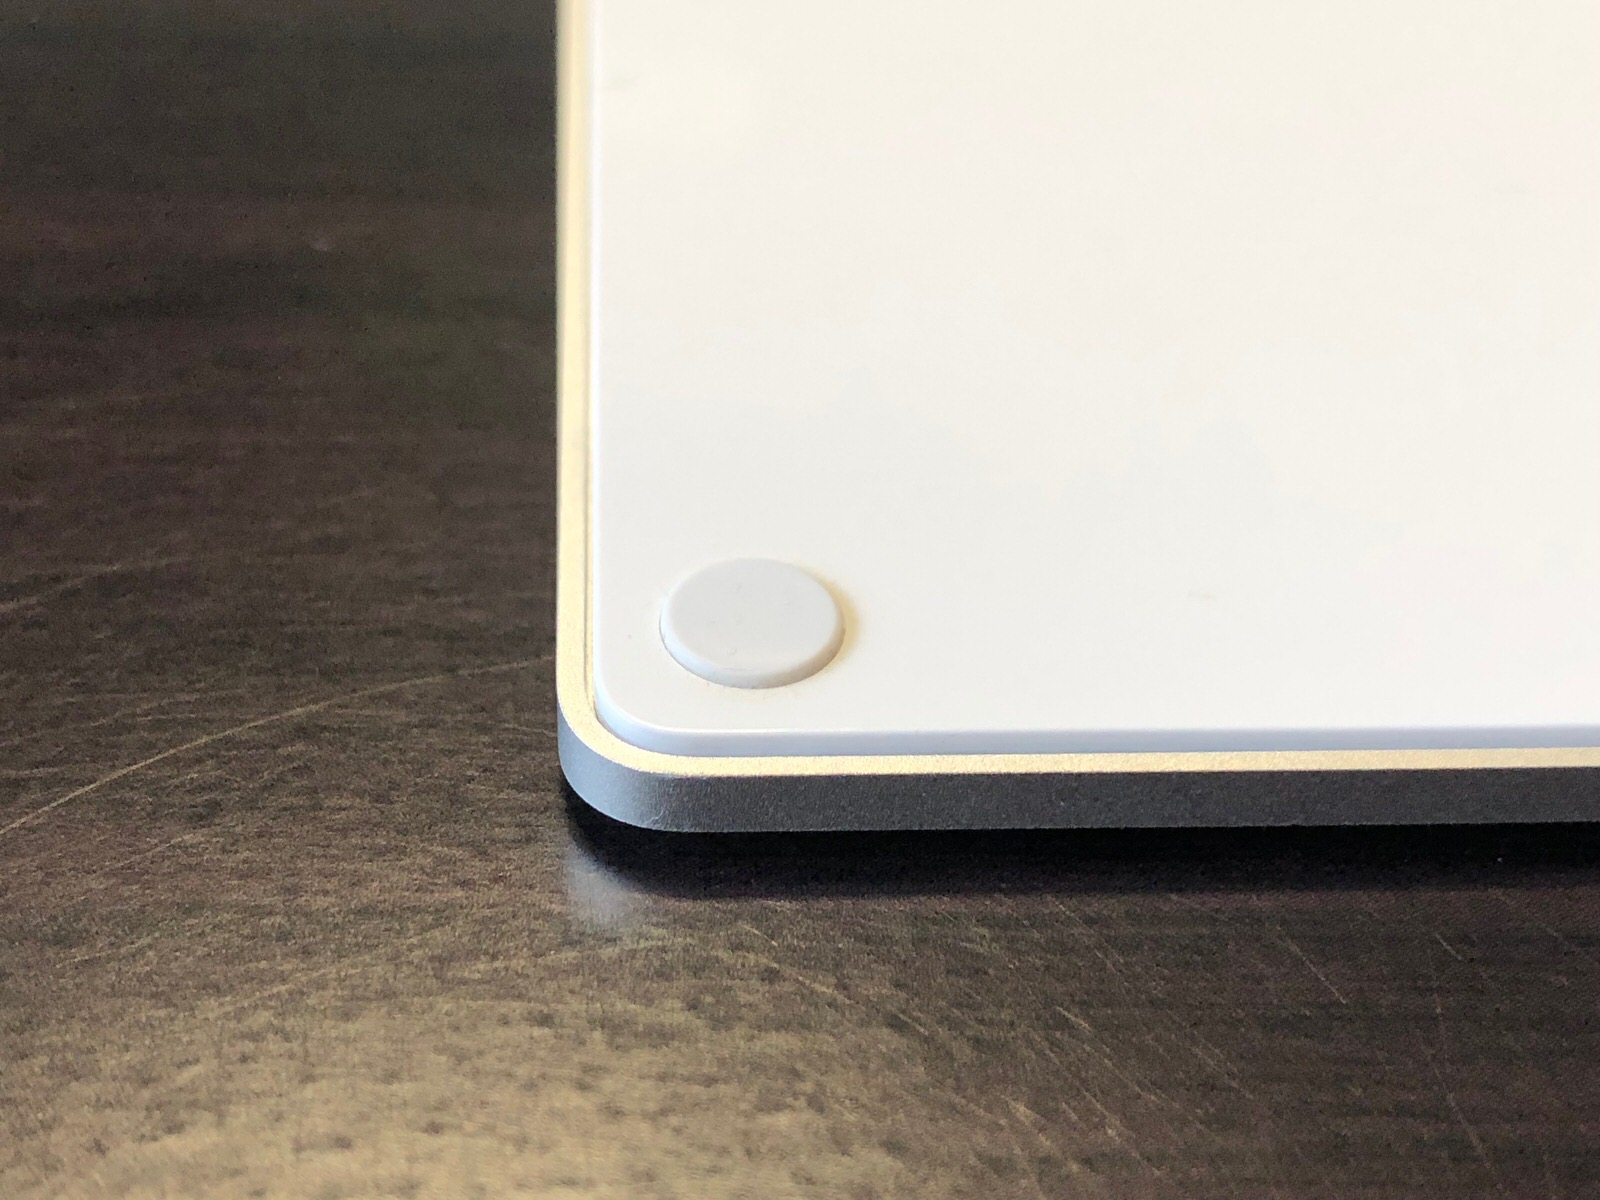 Apple Magic Keyboard-2